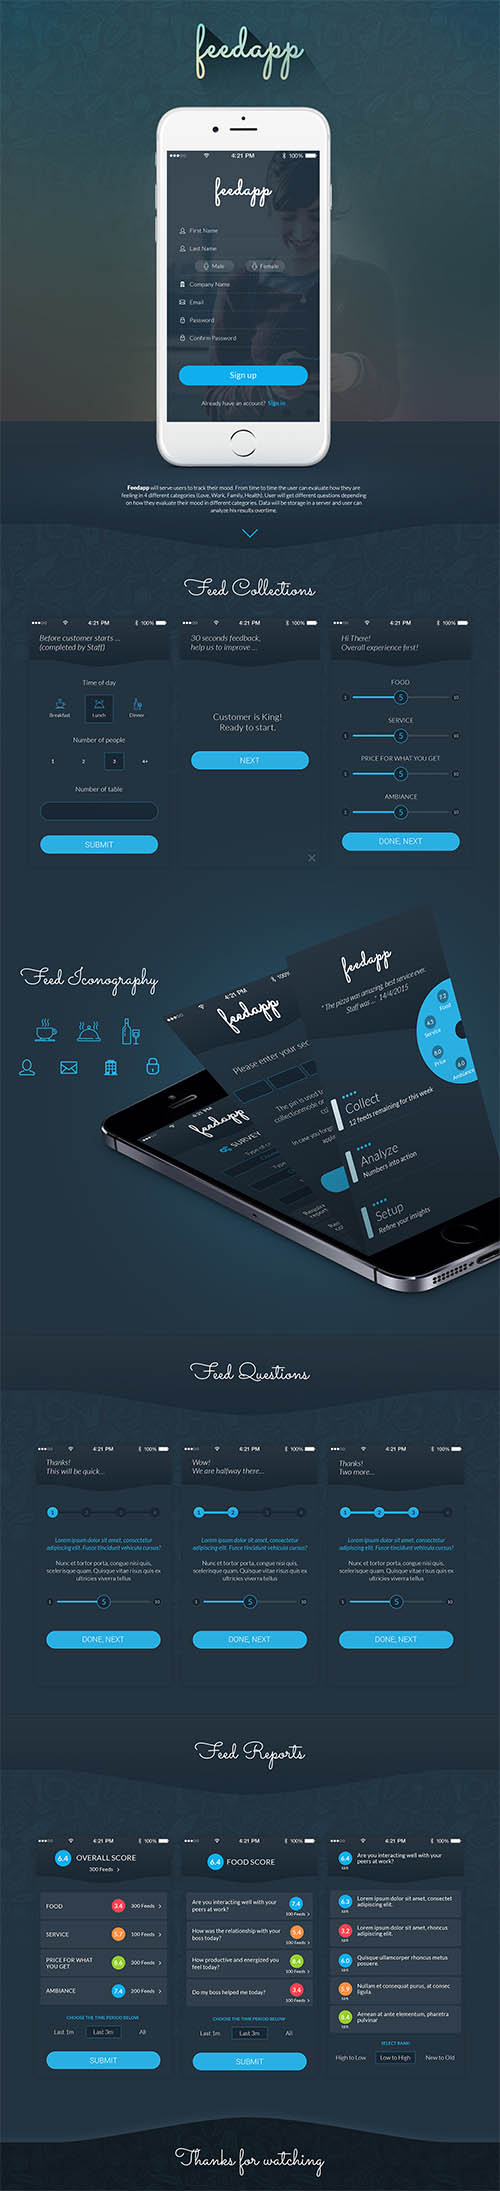 Flat App UI Kit By Chanchal Pramanik